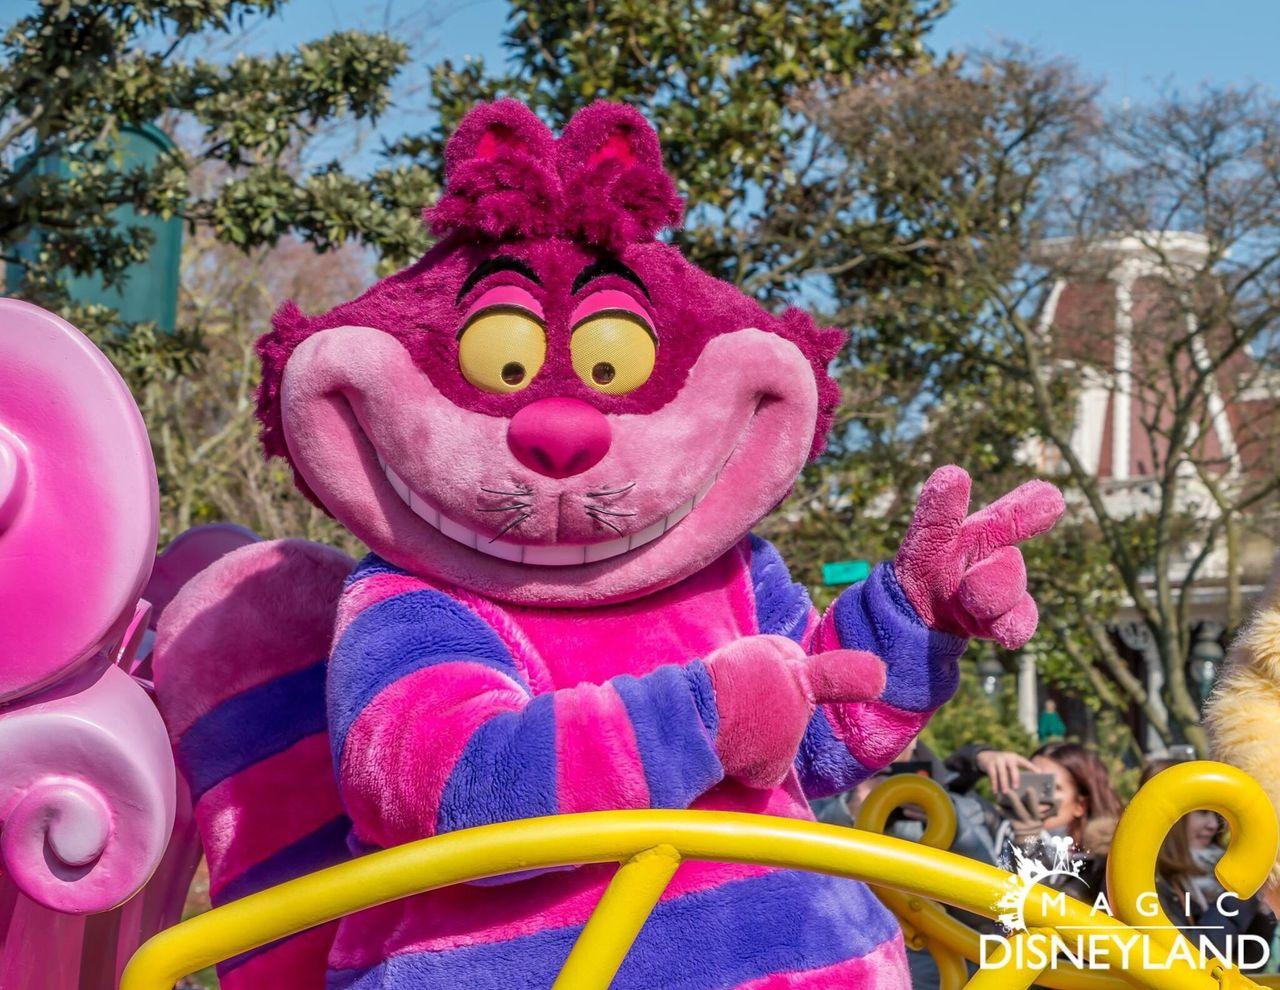 Pink Color Disney Waltdisney Disneyland Resort Paris Hdrphotography Disneyland Paris Celebration Disneyland HDR